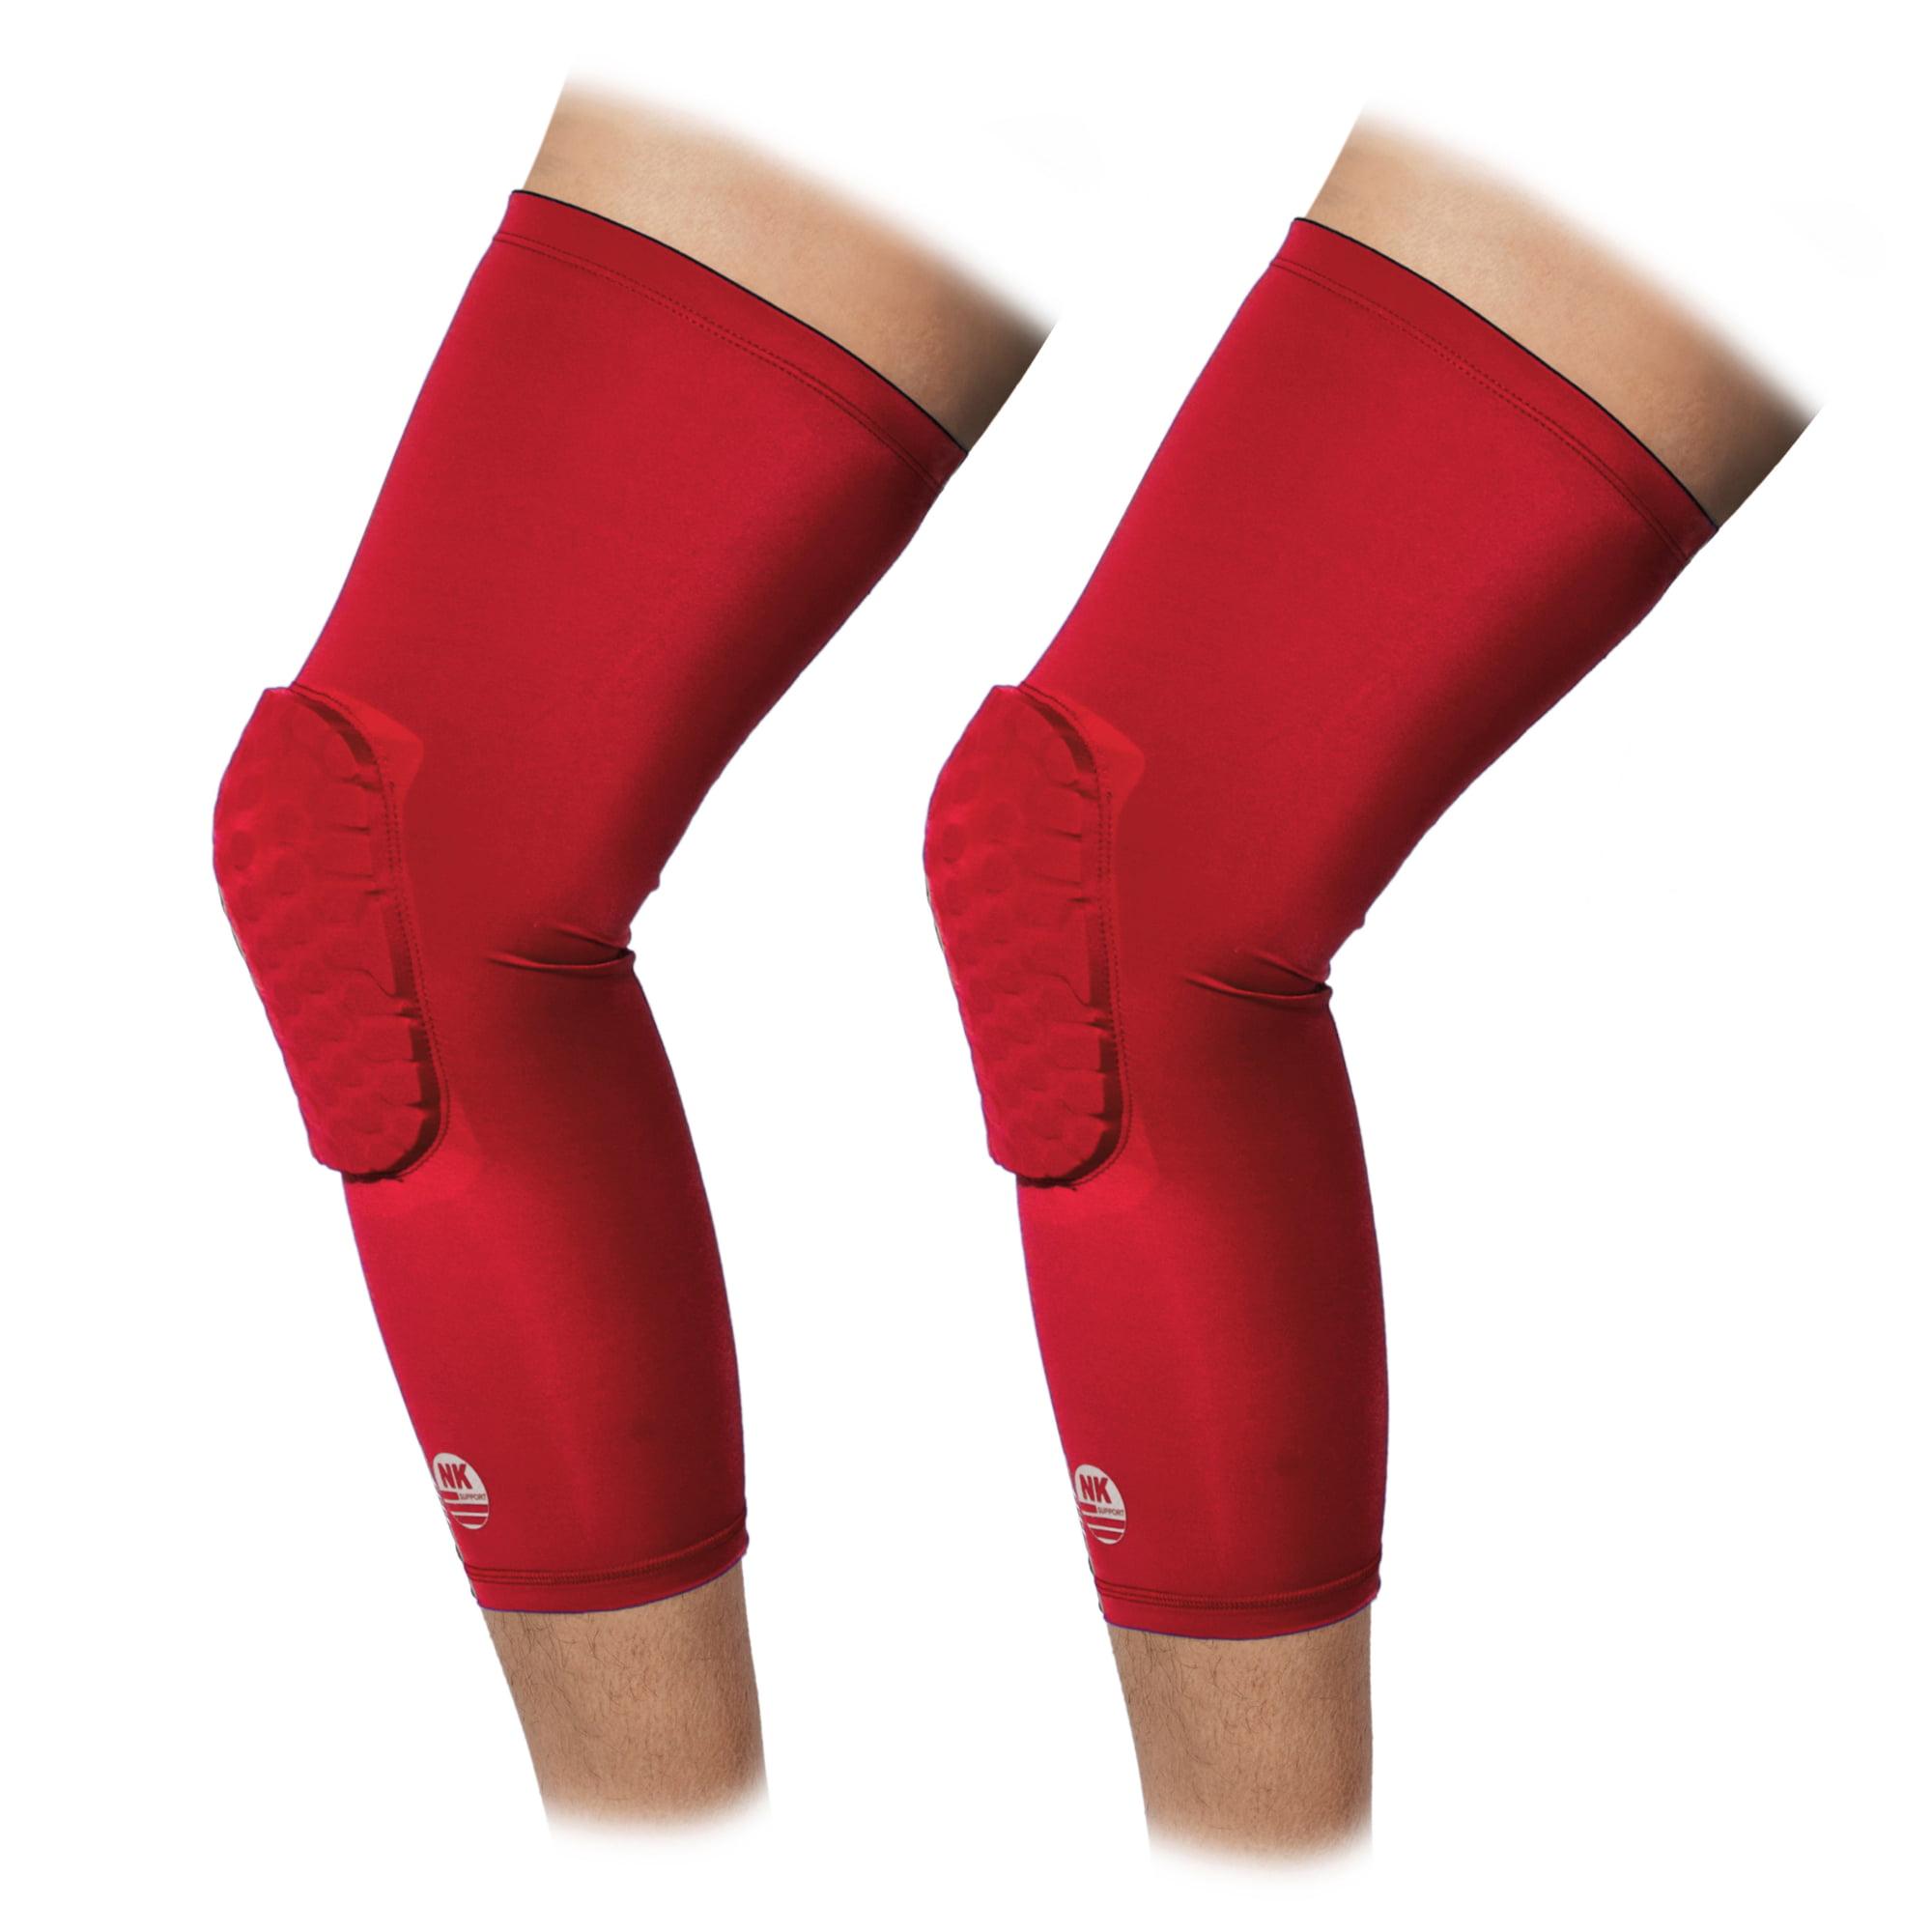 Nk Support Knee Pads Basketball Volleyball Protective Kneepads Honeycomb Crashproof Leg Sleeves Pair Red Walmart Com Walmart Com